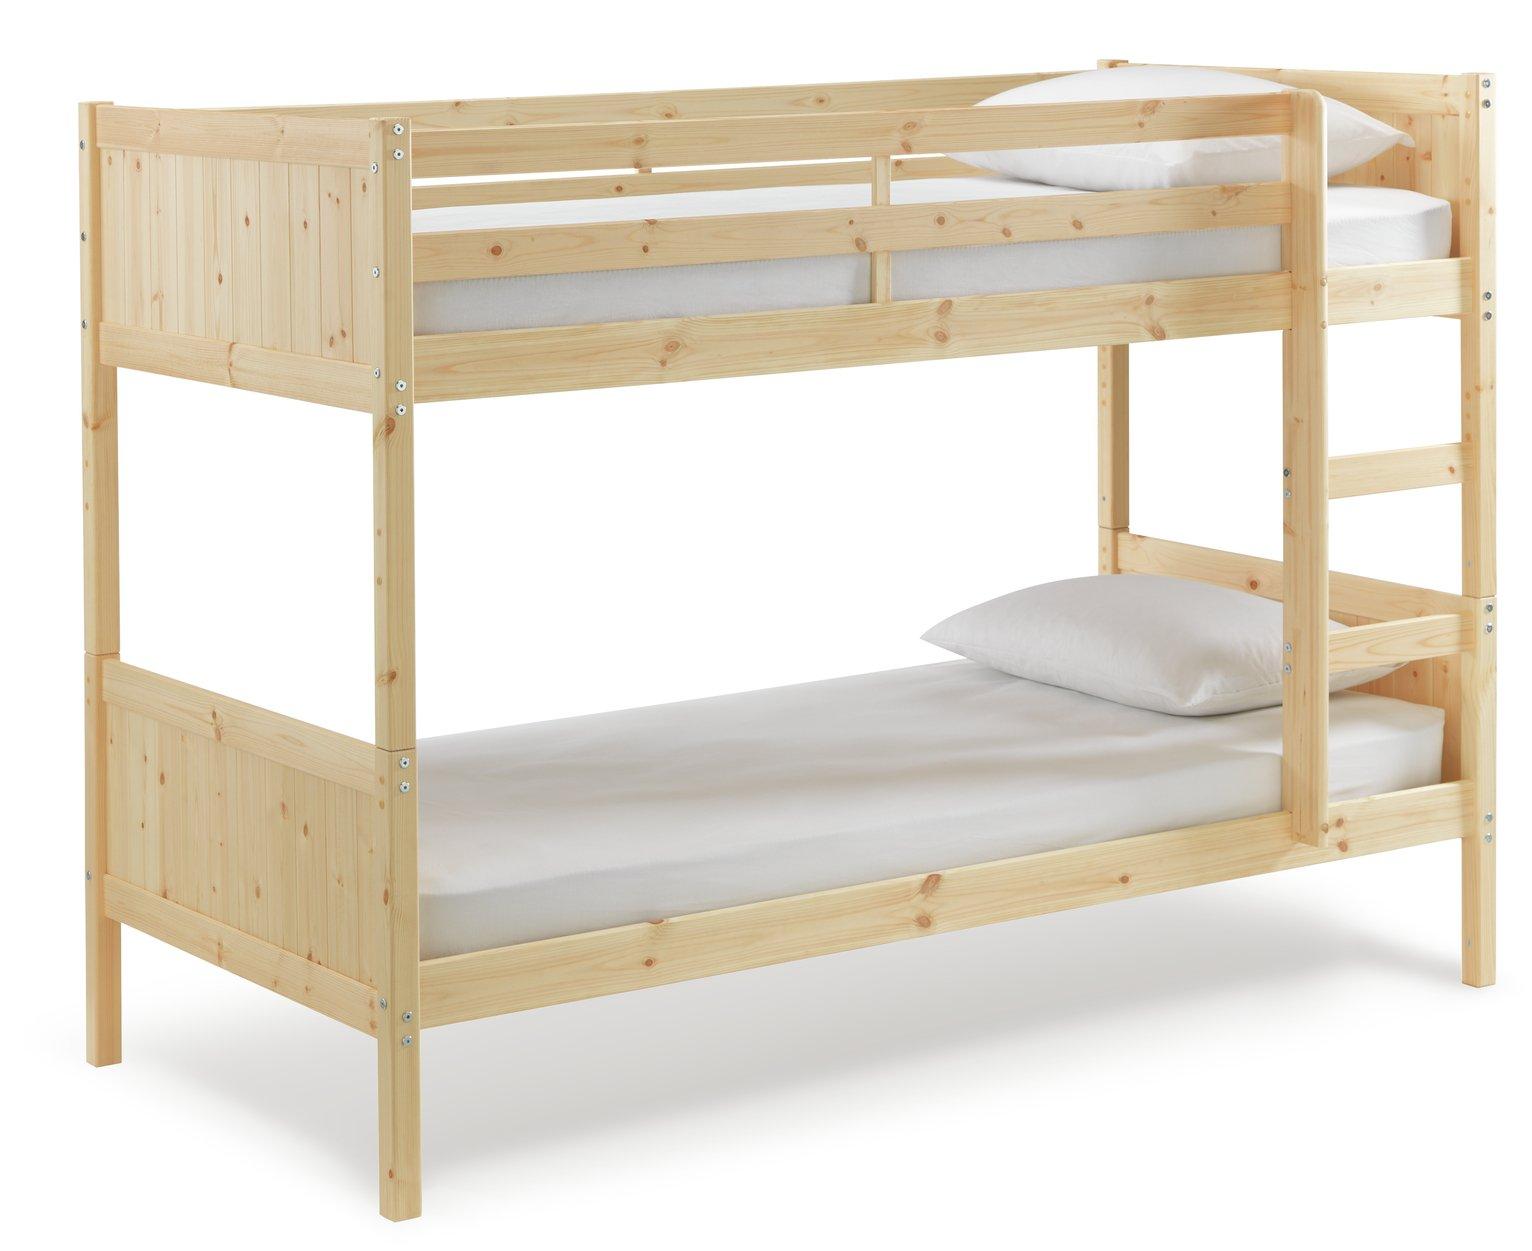 Habitat Detachable Bunk Bed Frame - Pine